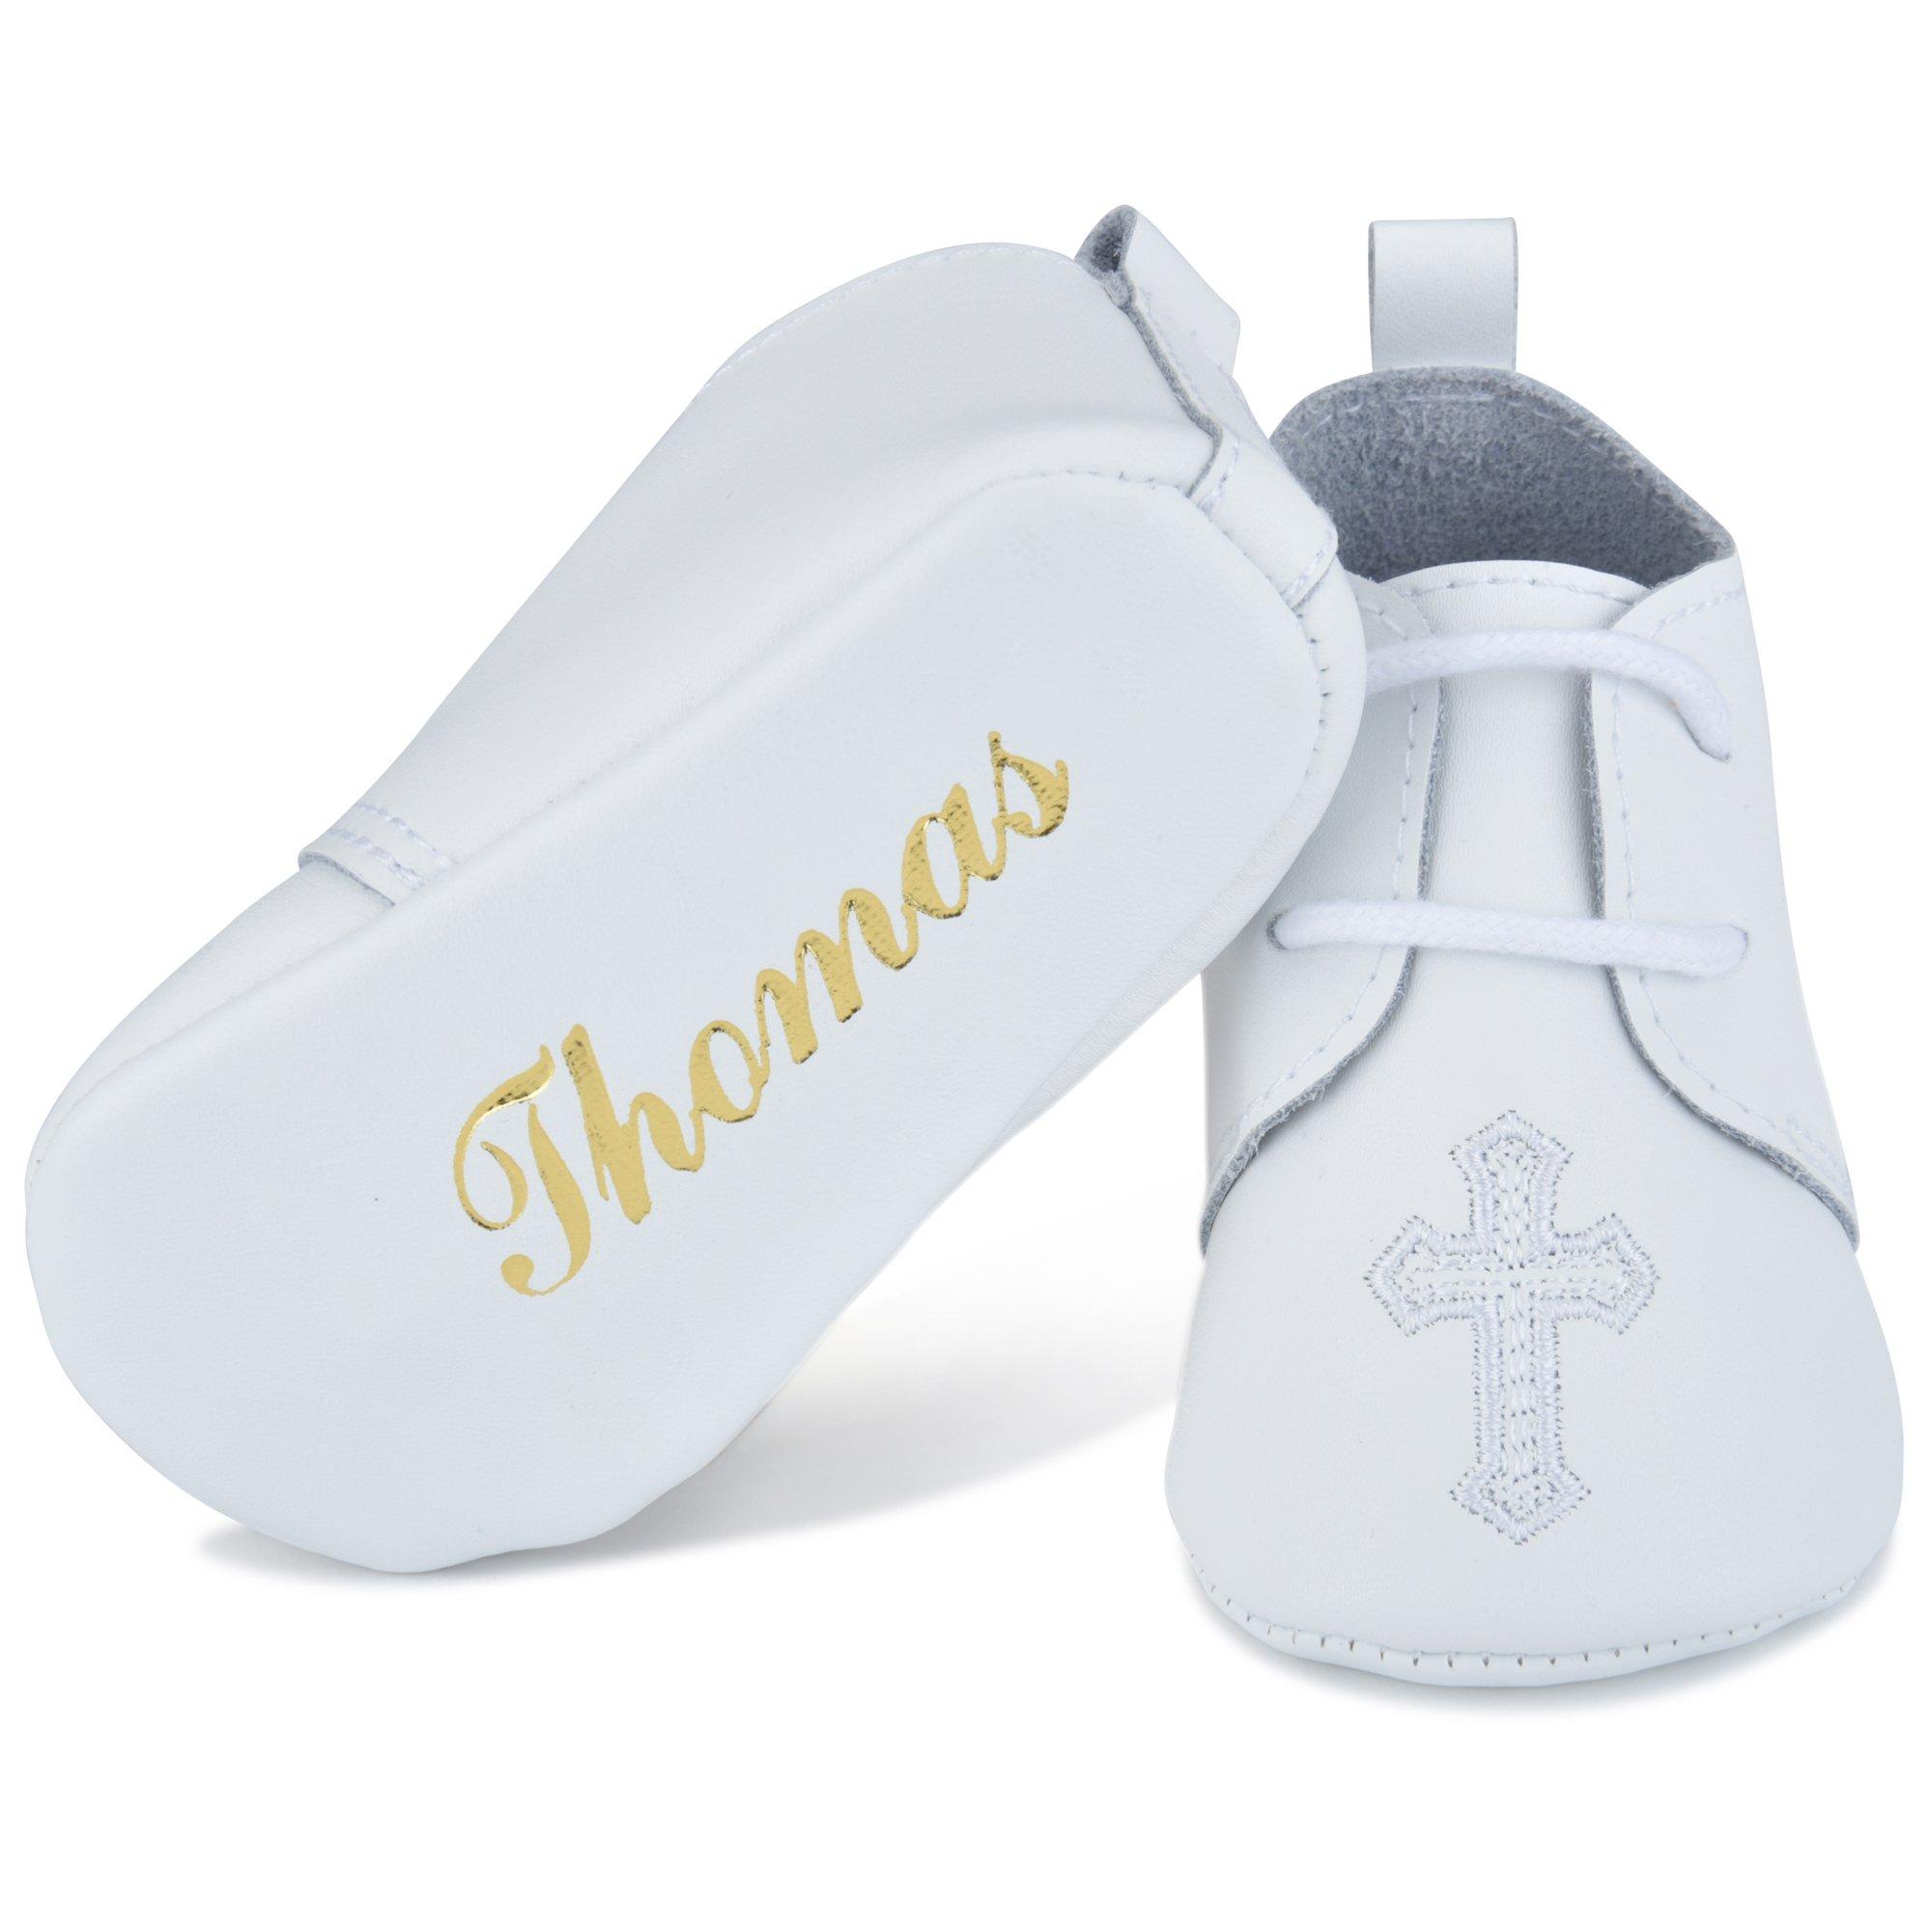 Personalized Leather Christening Baptism Shoe White by Babyshoe.com